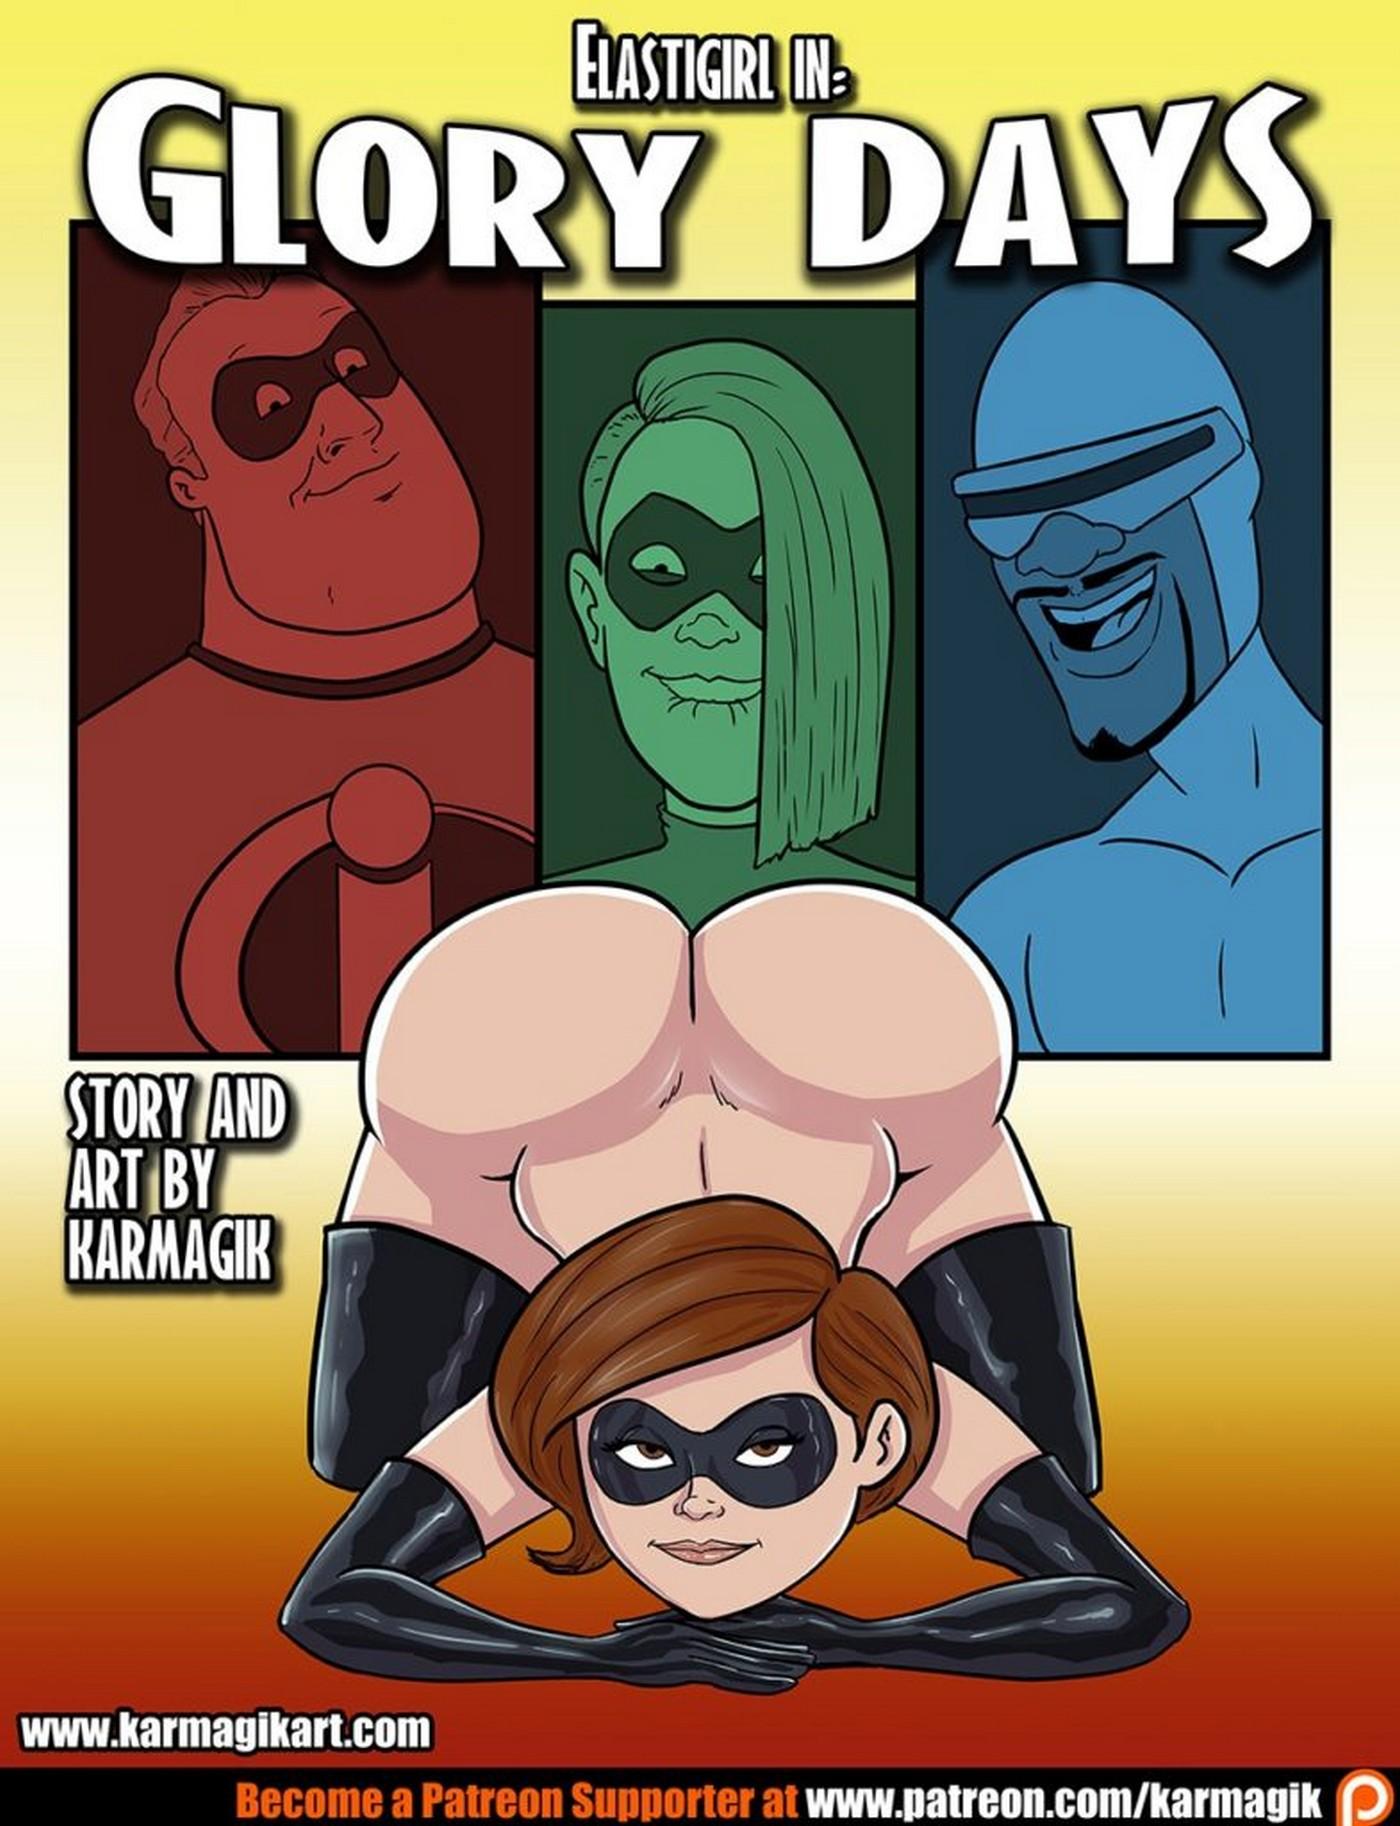 The Incredibles Elastigirl in Glory Days 03